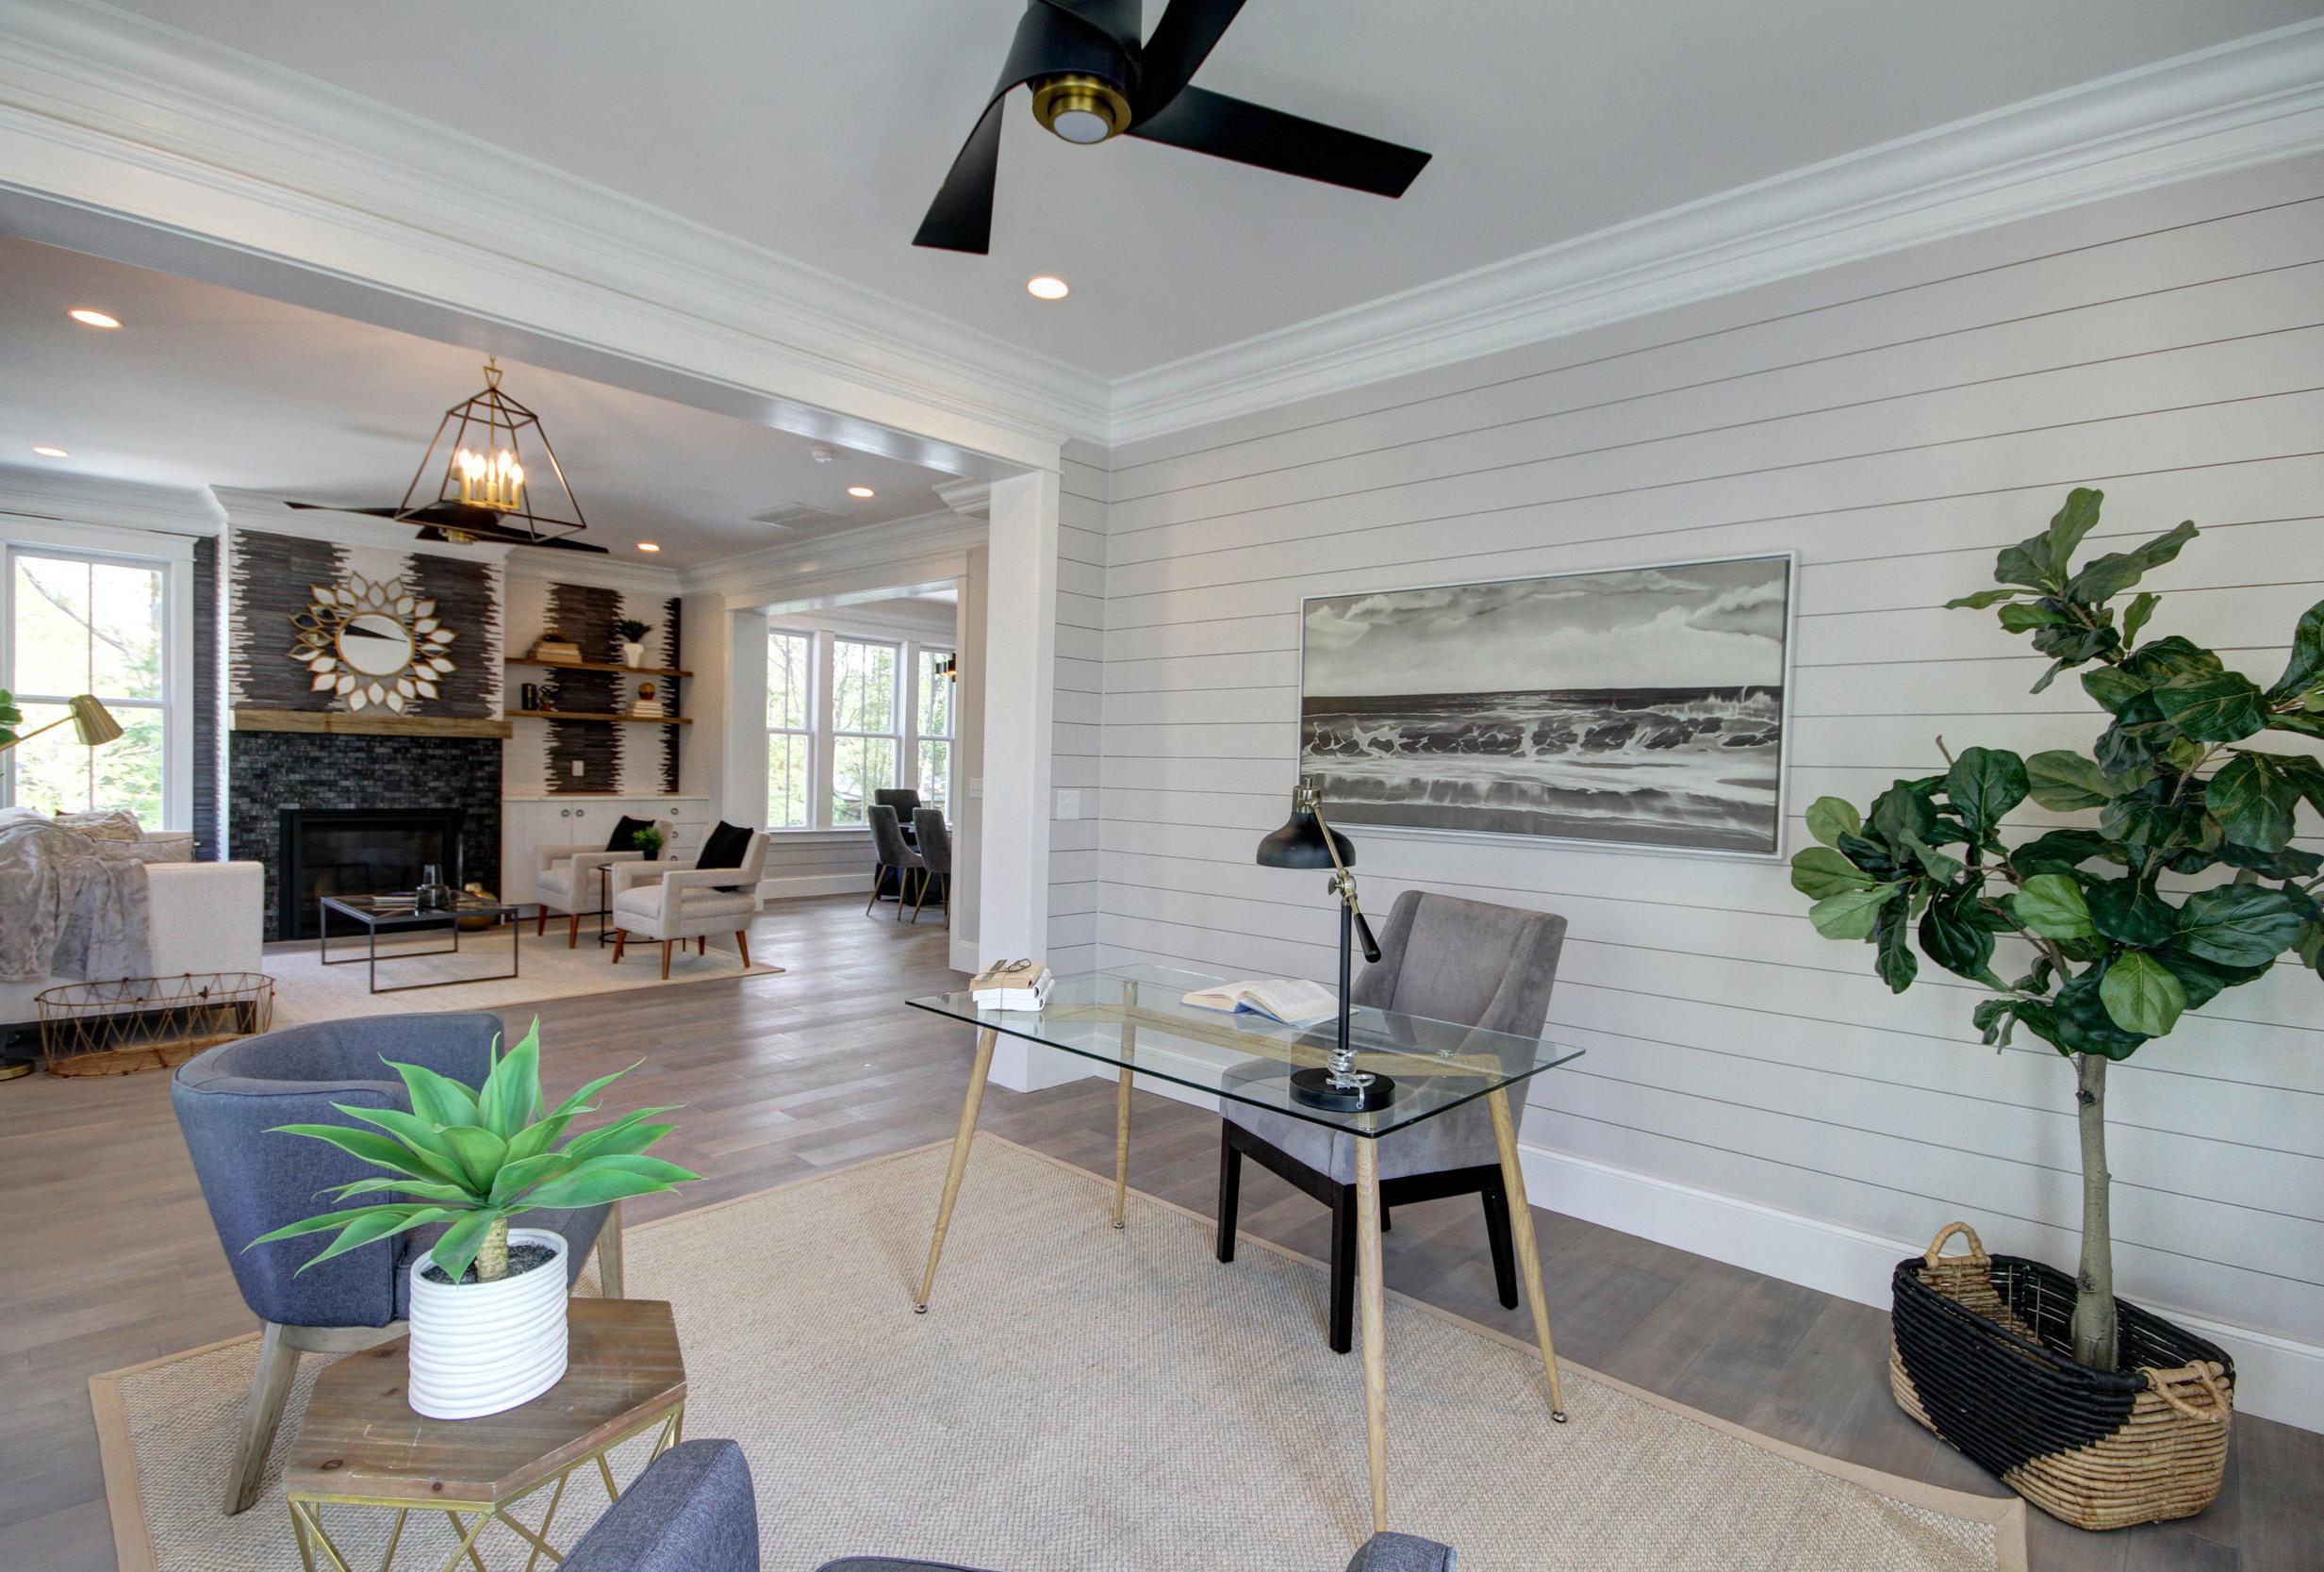 Mathis Ferry Court Homes For Sale - 1212 Clonmel Place, Mount Pleasant, SC - 15